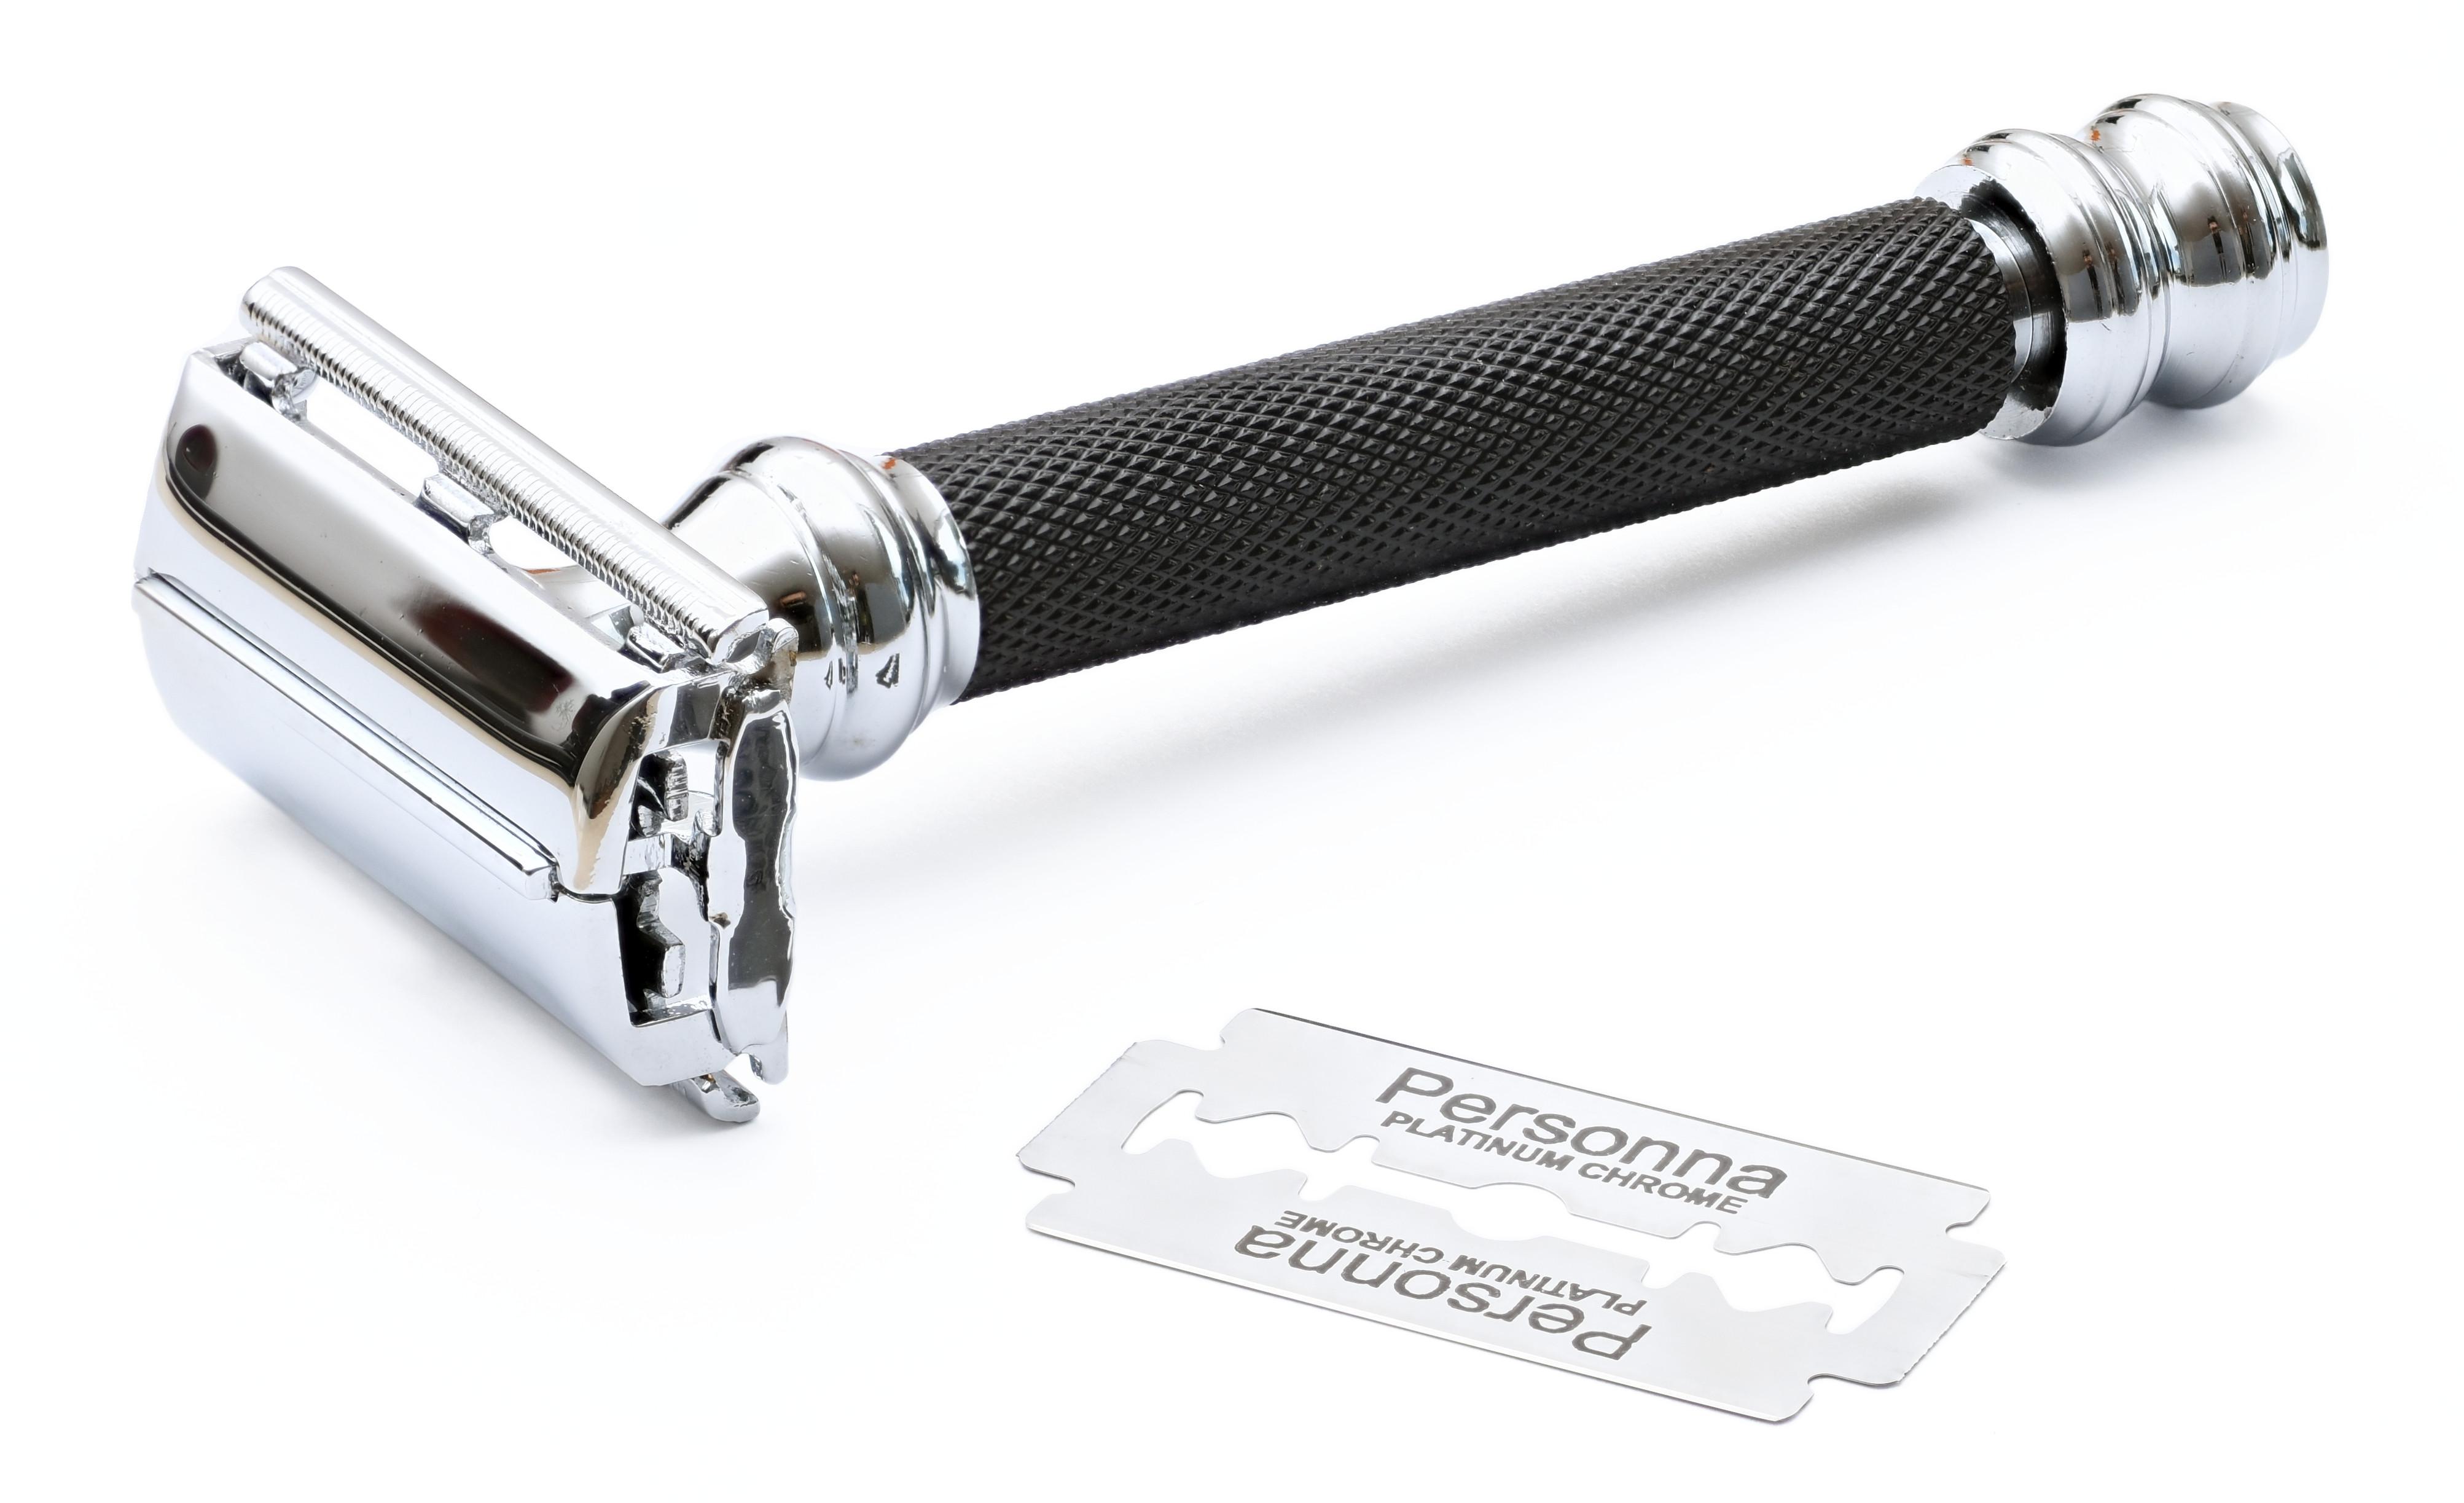 A safety razor